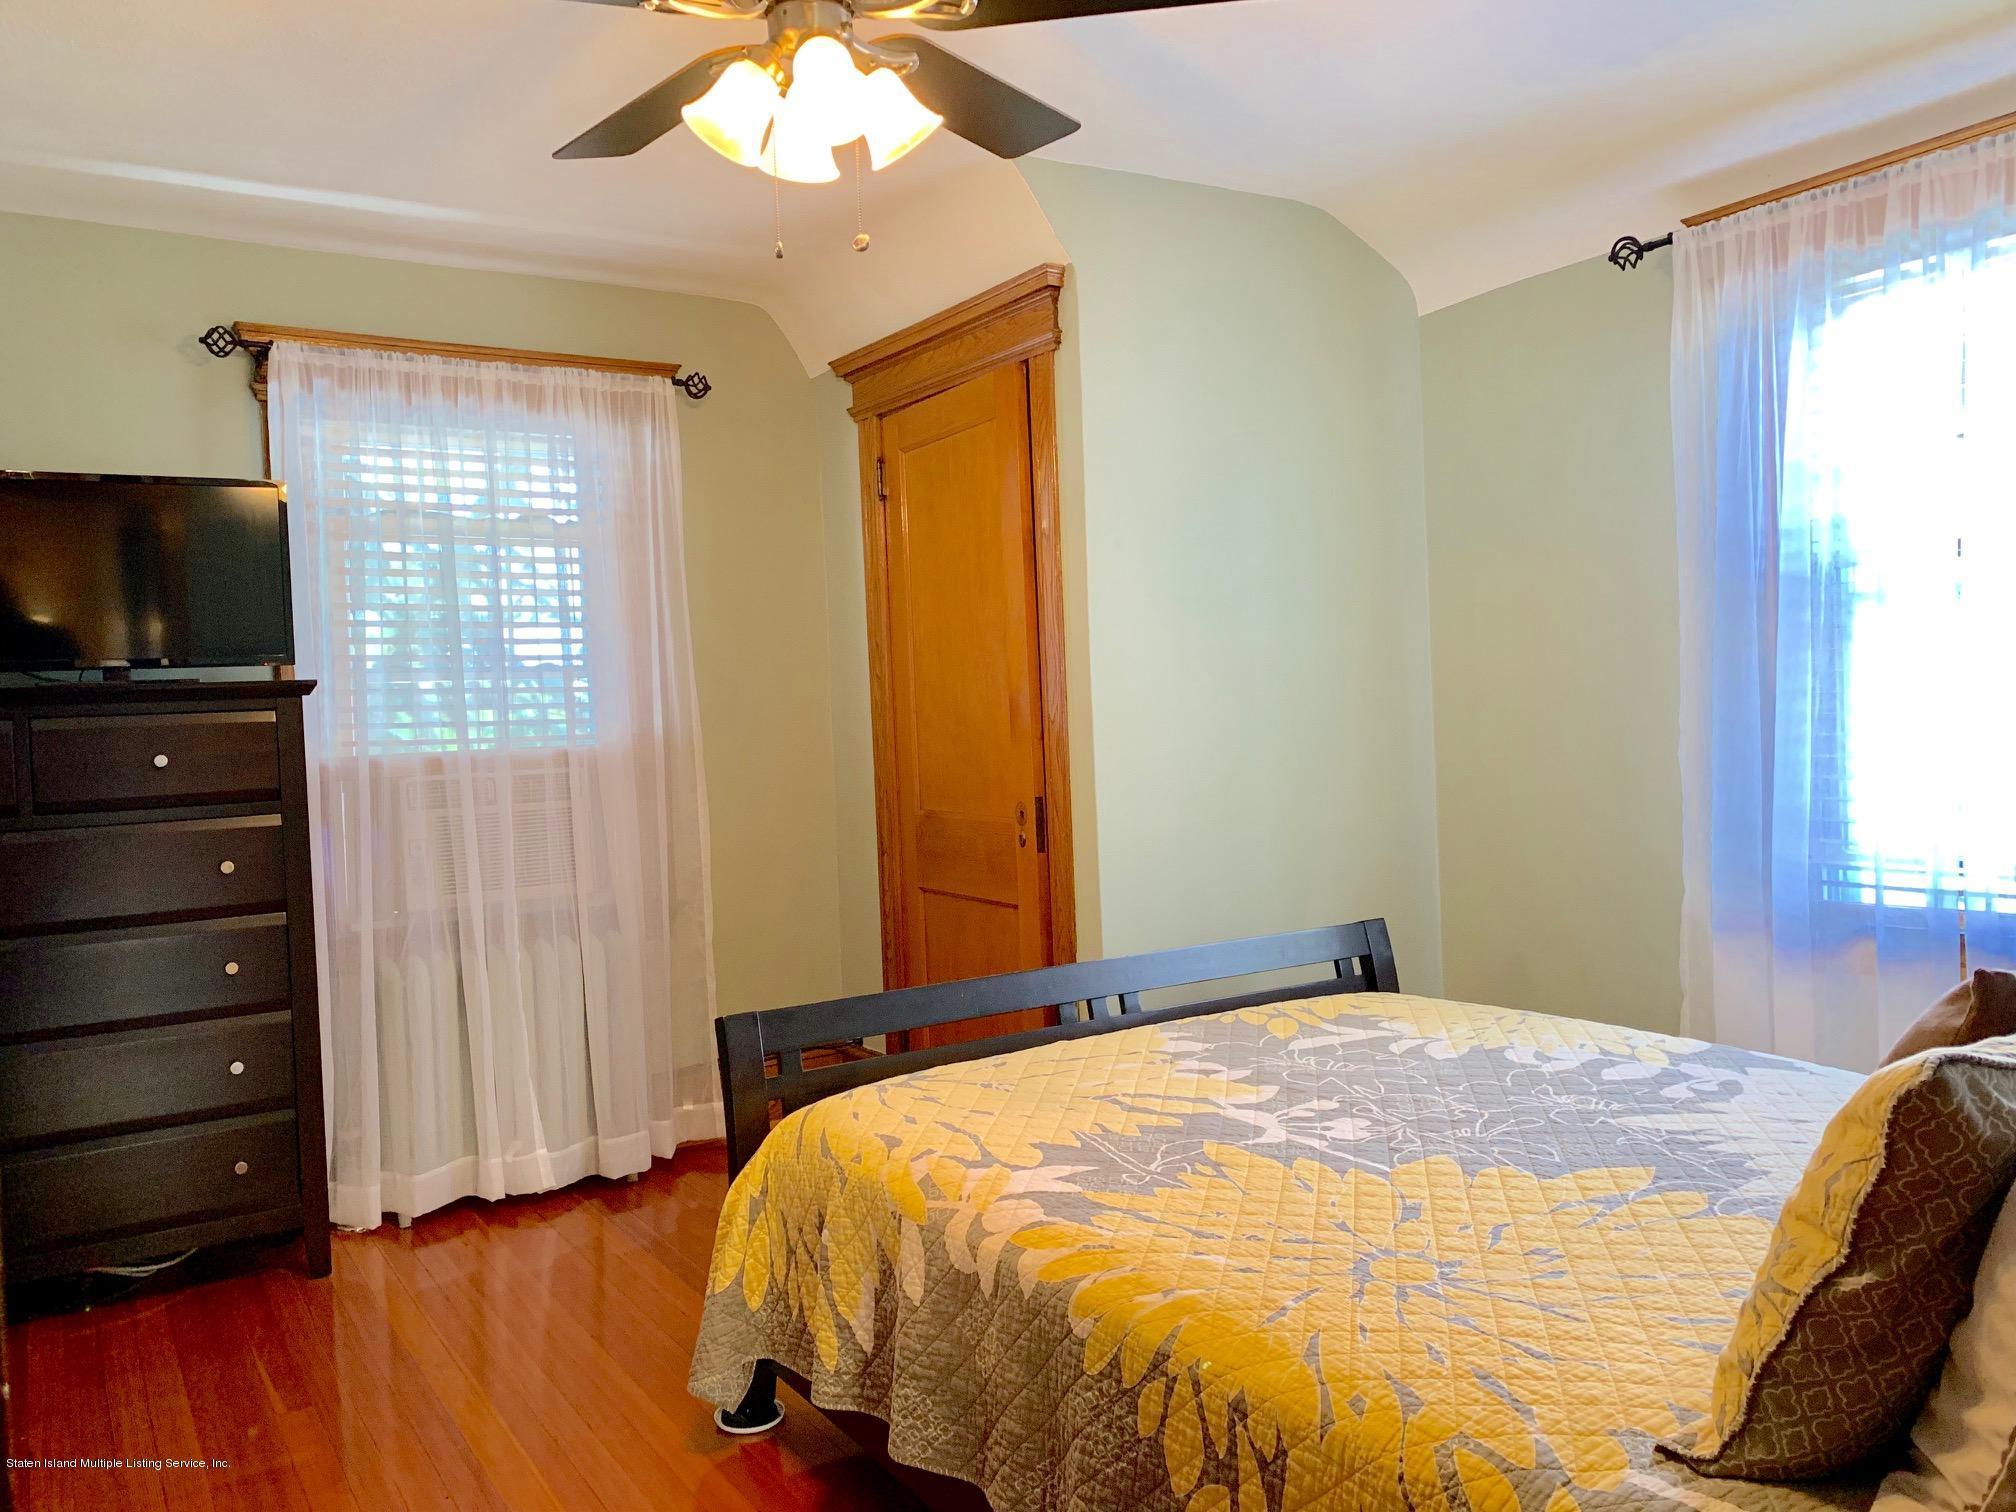 Single Family - Detached 195 Fairview Avenue  Staten Island, NY 10314, MLS-1132423-27